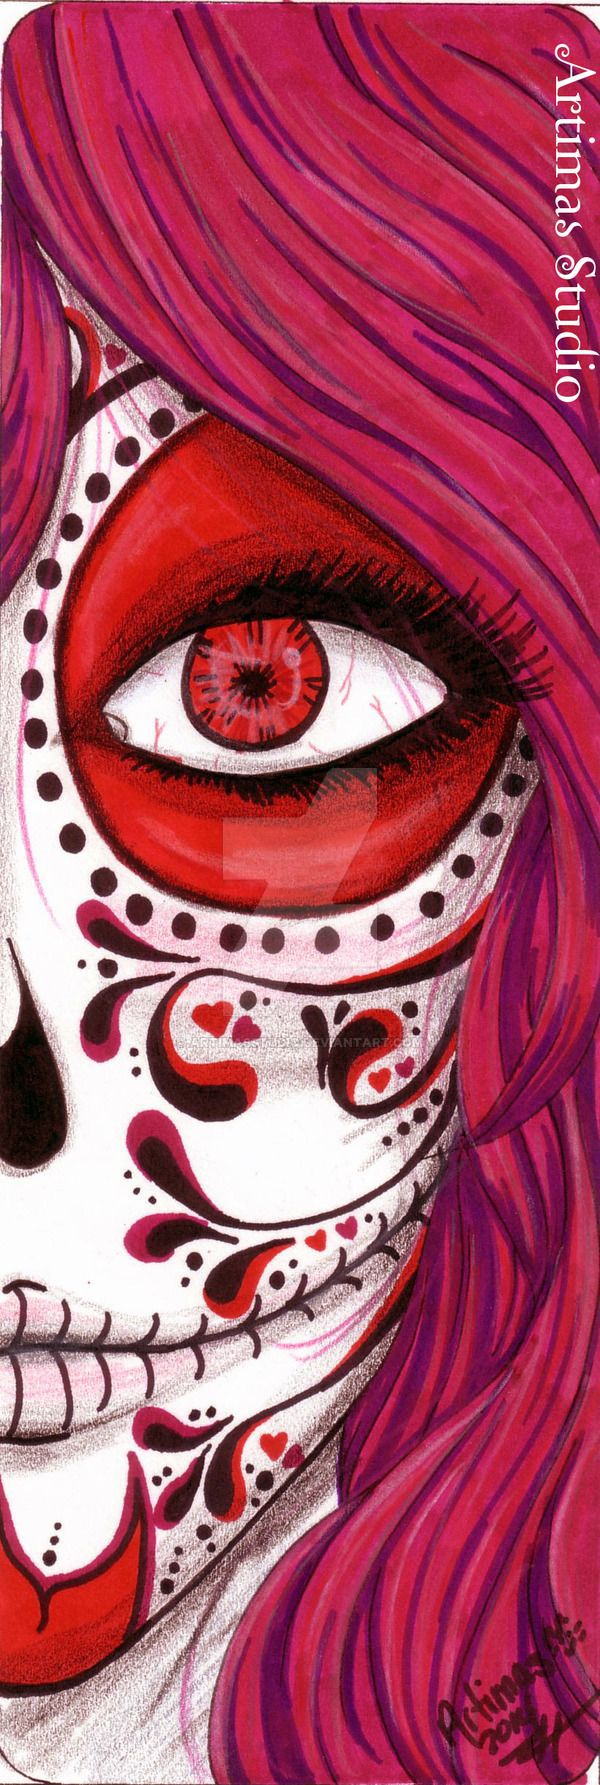 Pink Death 1.5 by ArtimasStudio.deviantart.com on @DeviantArt